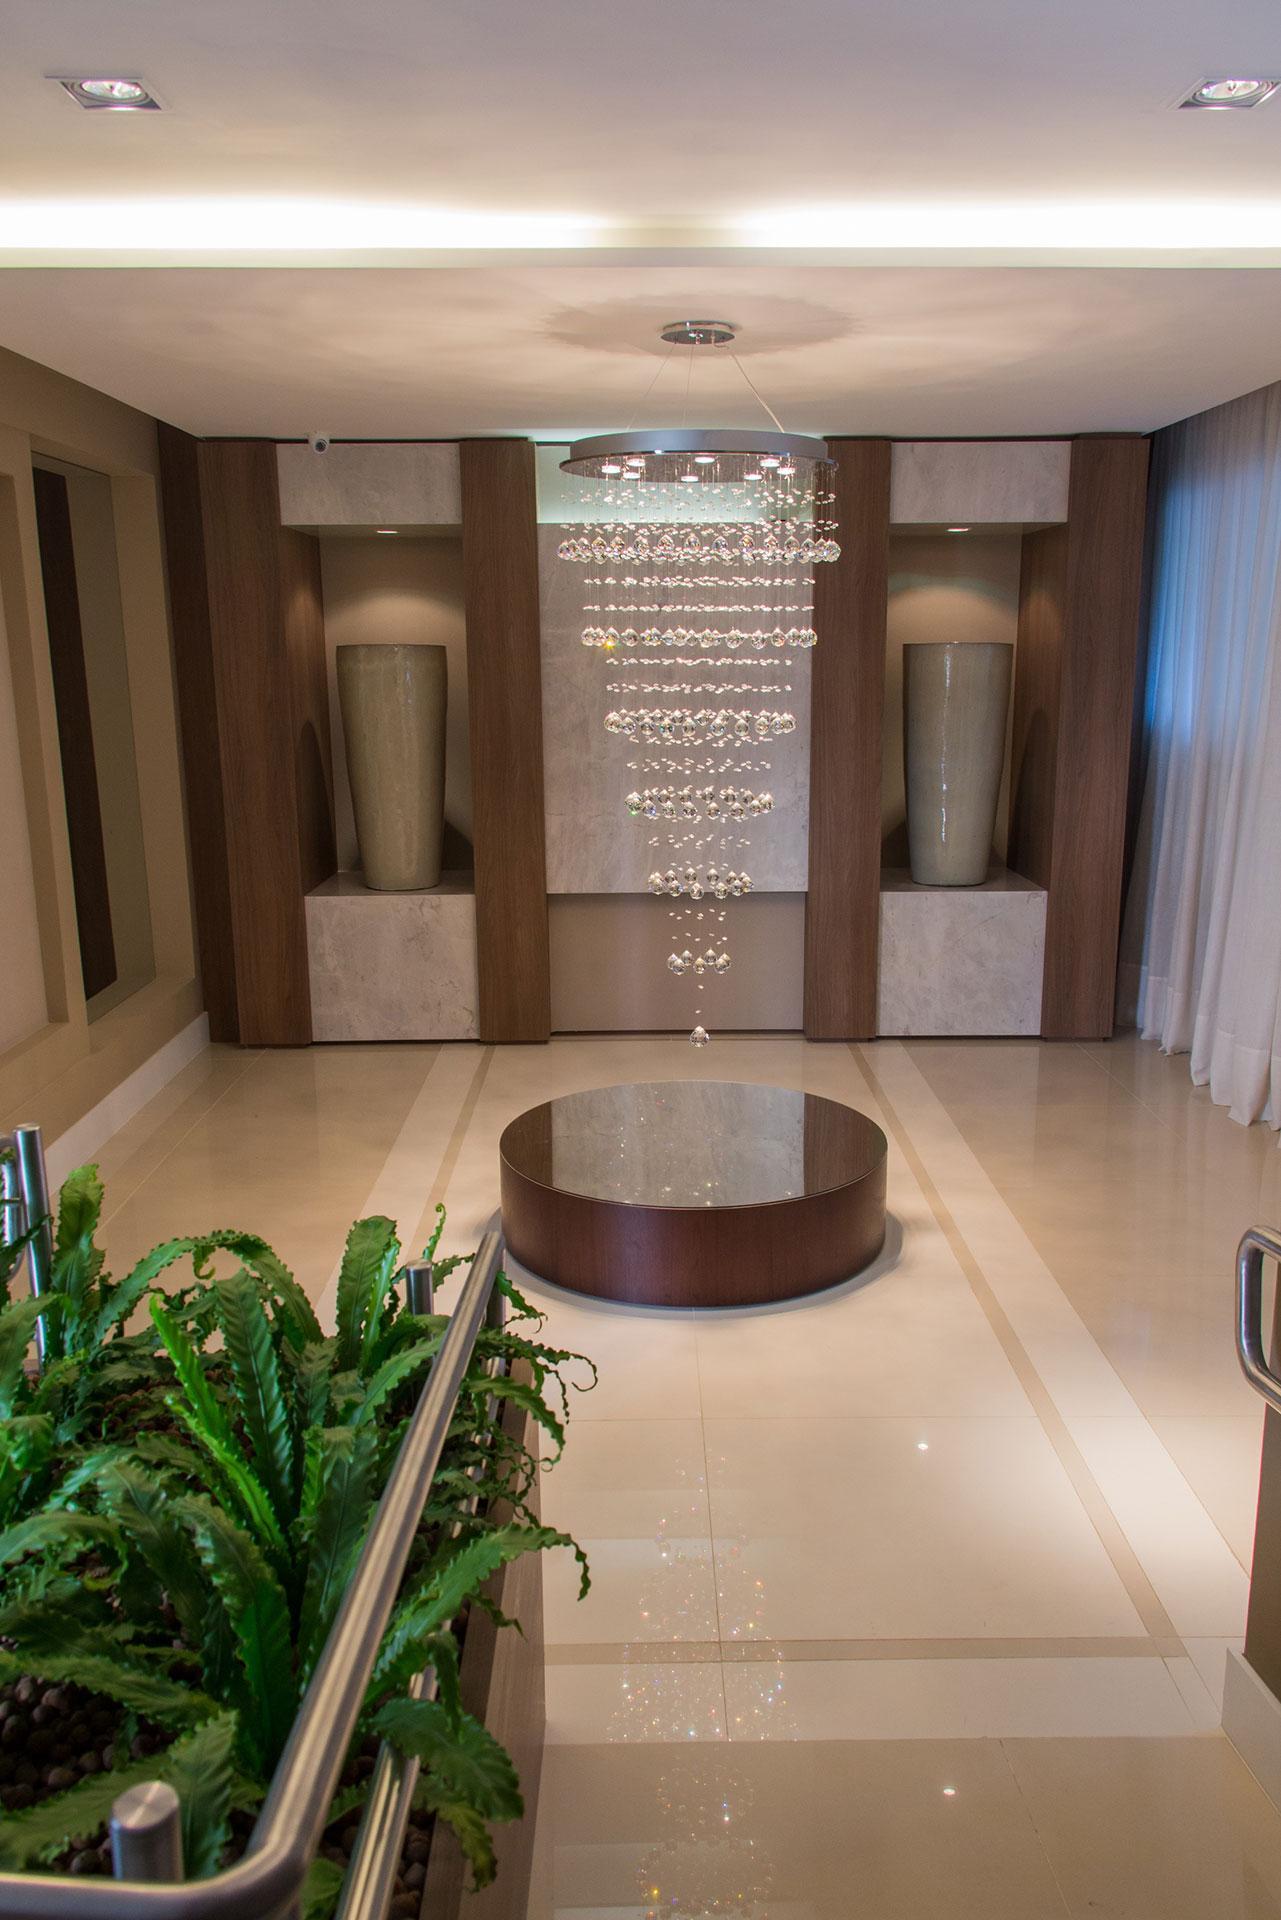 Lobby | Reserva Juglair Ecoville – Apartamentono  Ecoville - Curitiba - Paraná